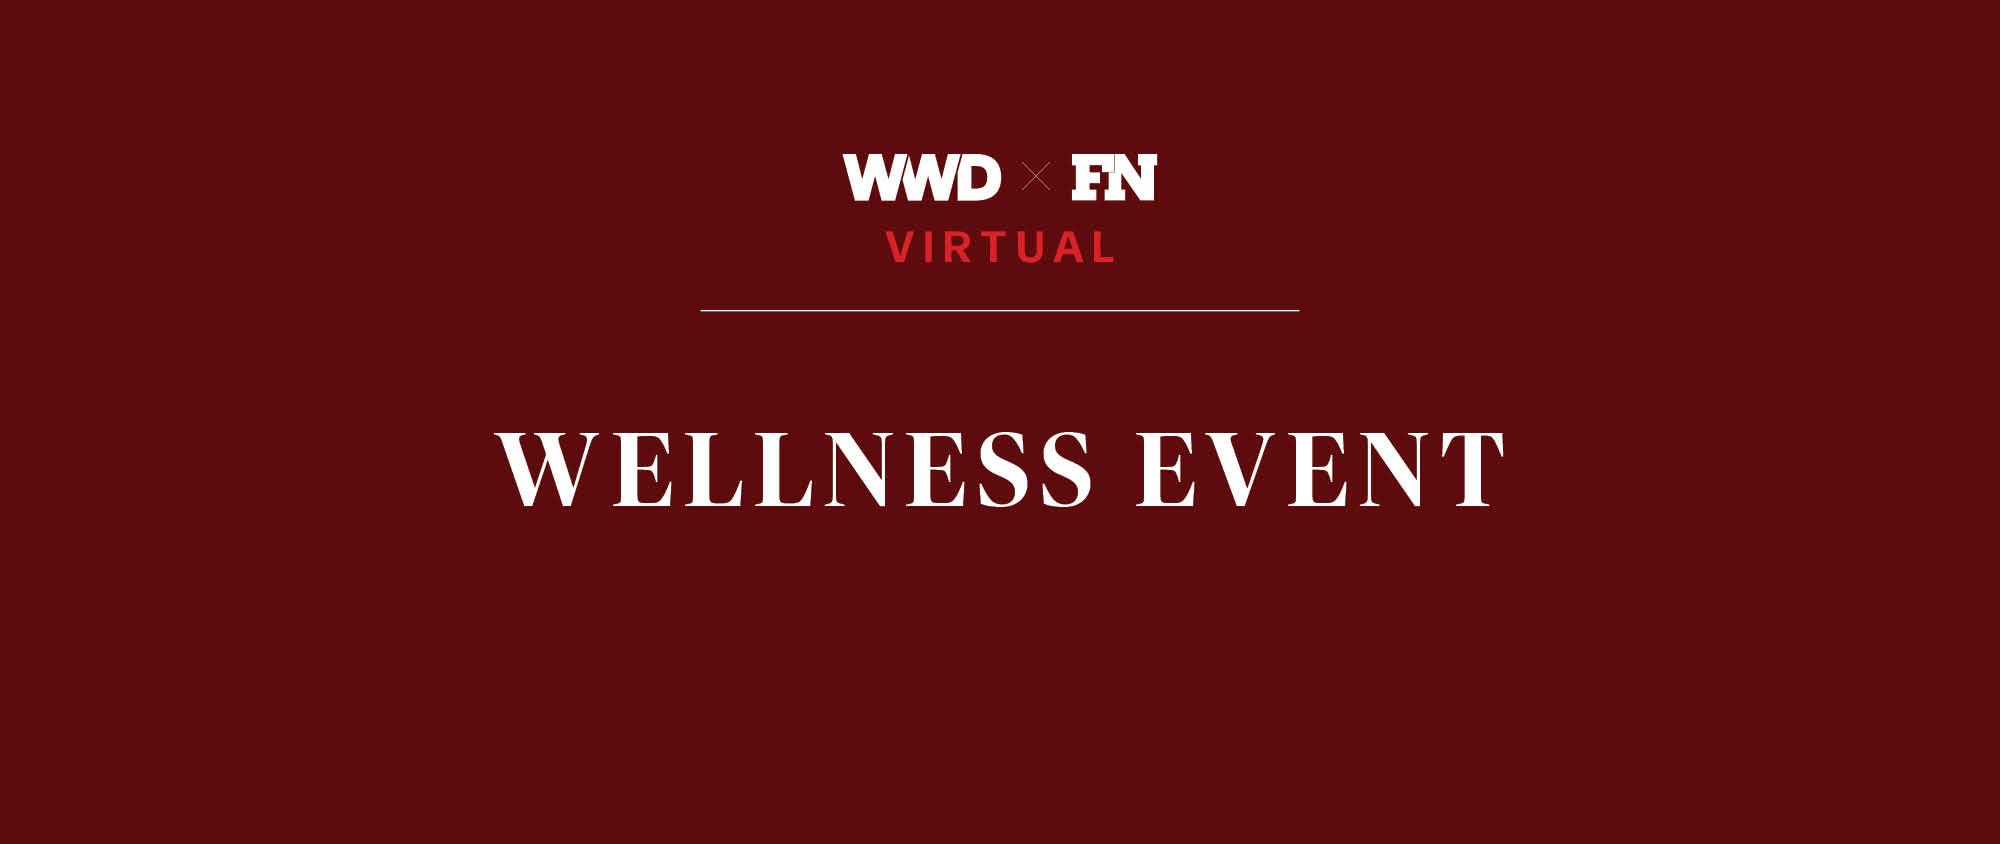 WWDxFN_VIRTUAL_WELLNESS-EVENT